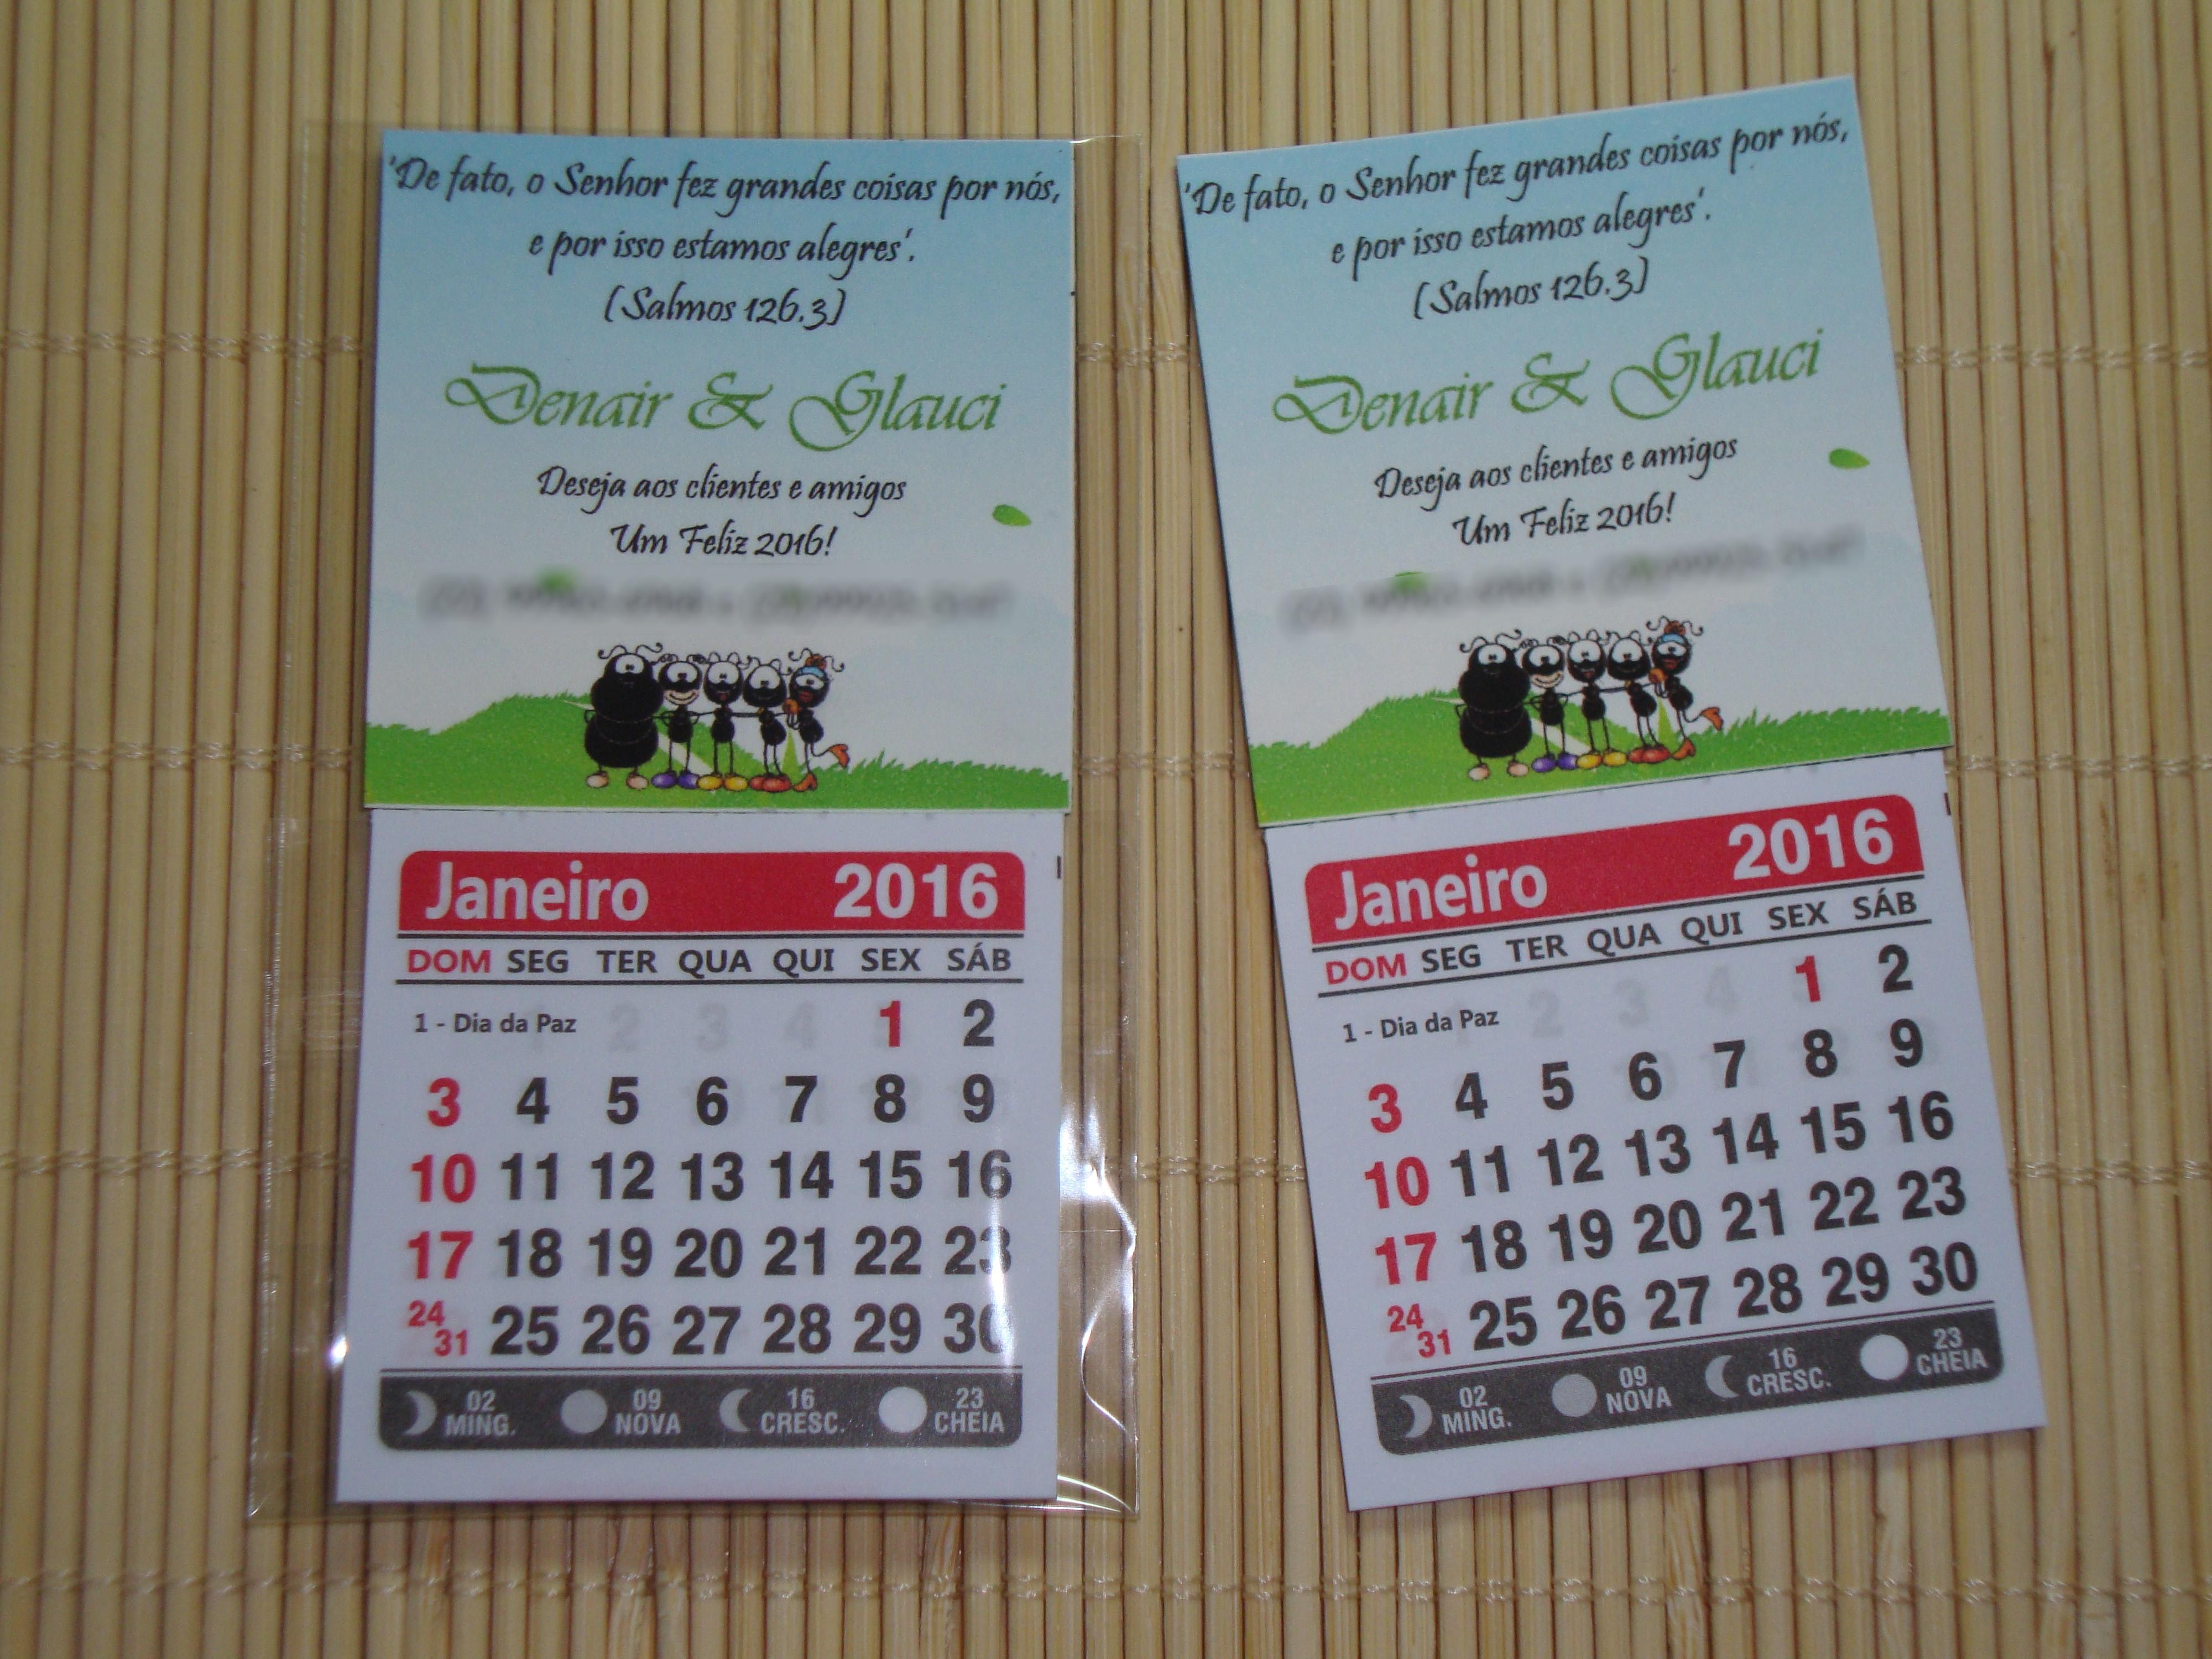 calendario 201 c ima smilinguido personalizada